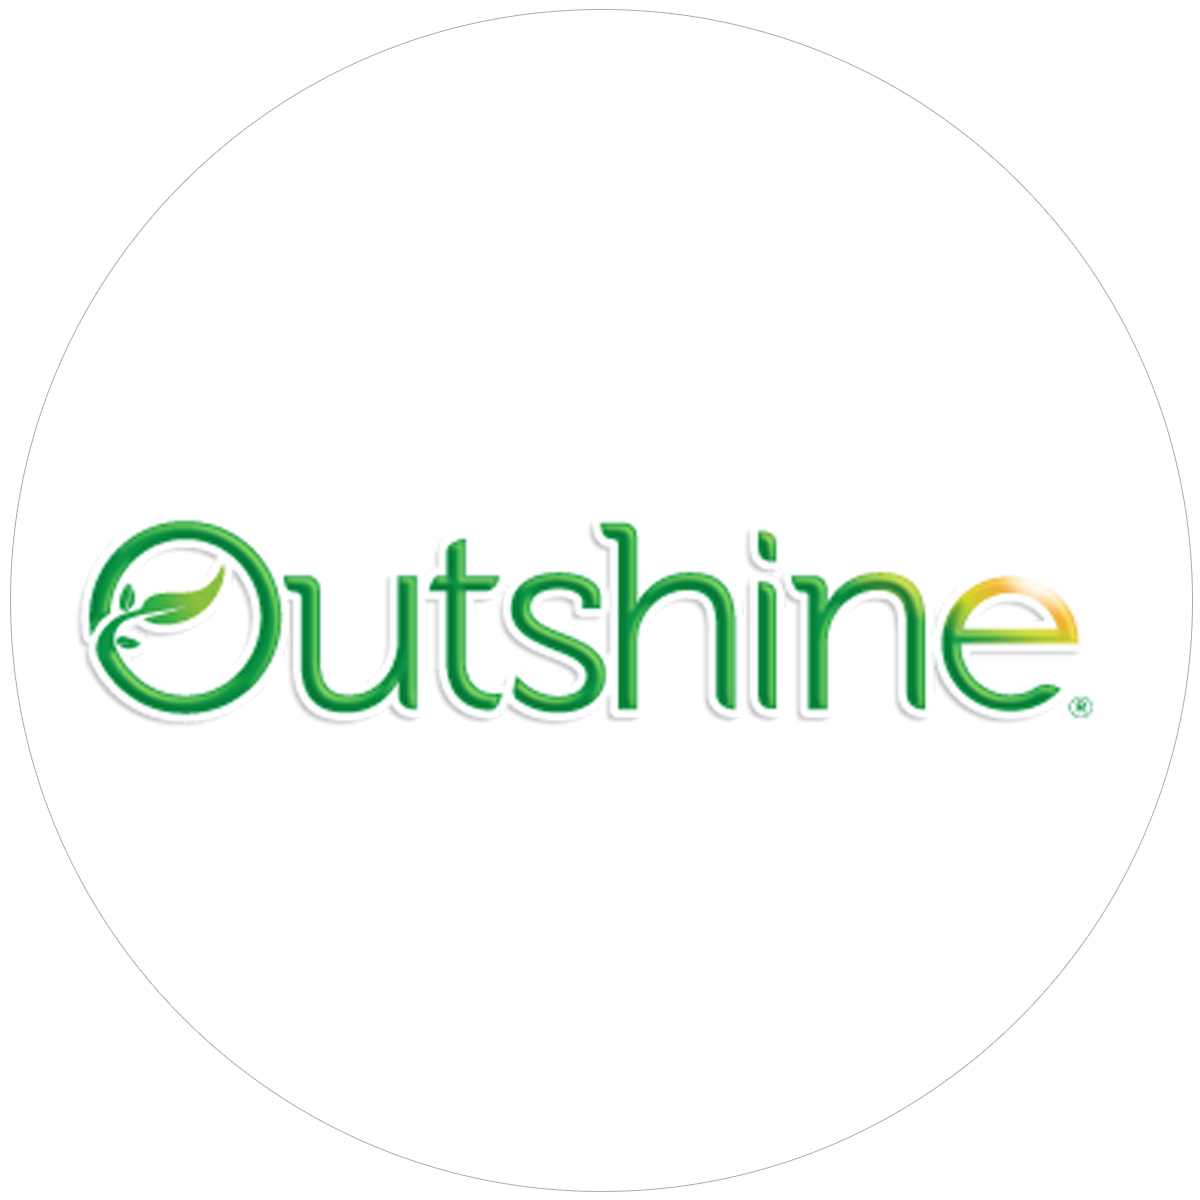 Outshine.jpg